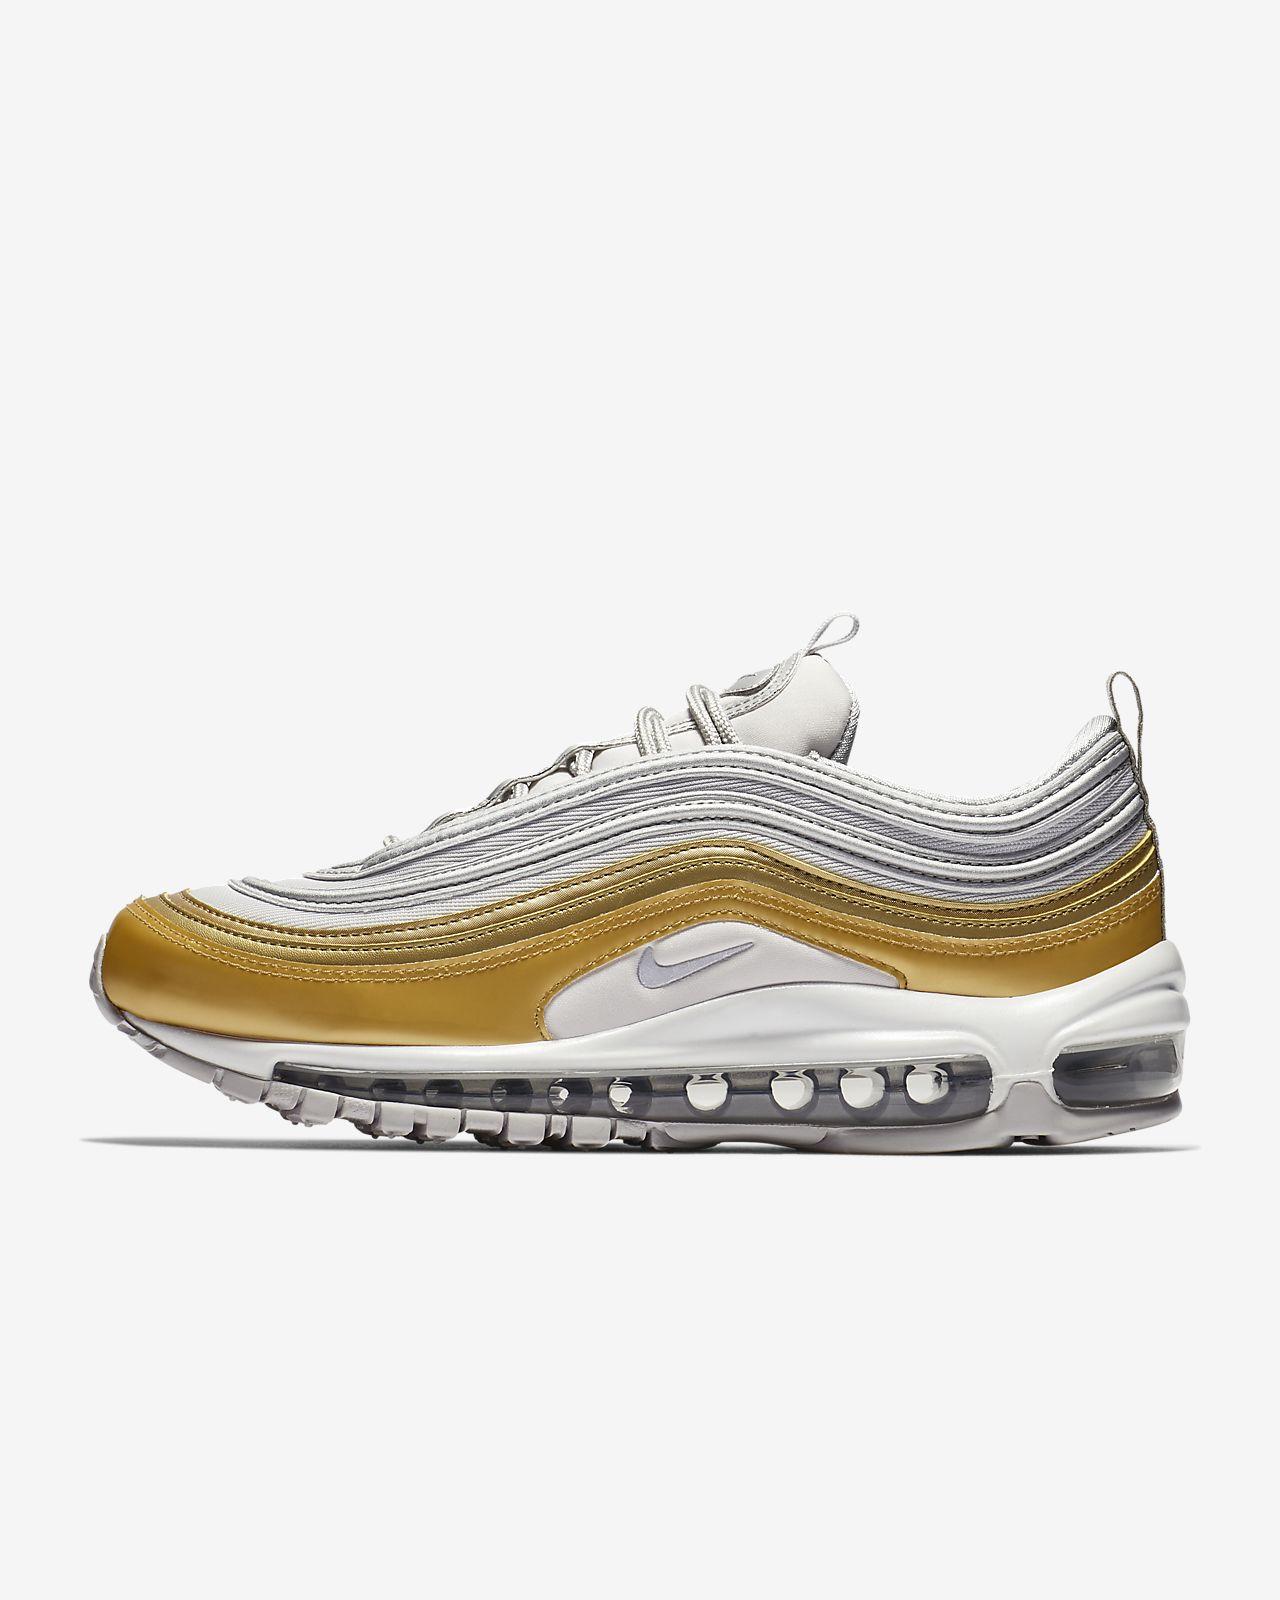 256f5a81d8b4fb Nike Air Max 97 SE Metallic Women s Shoe